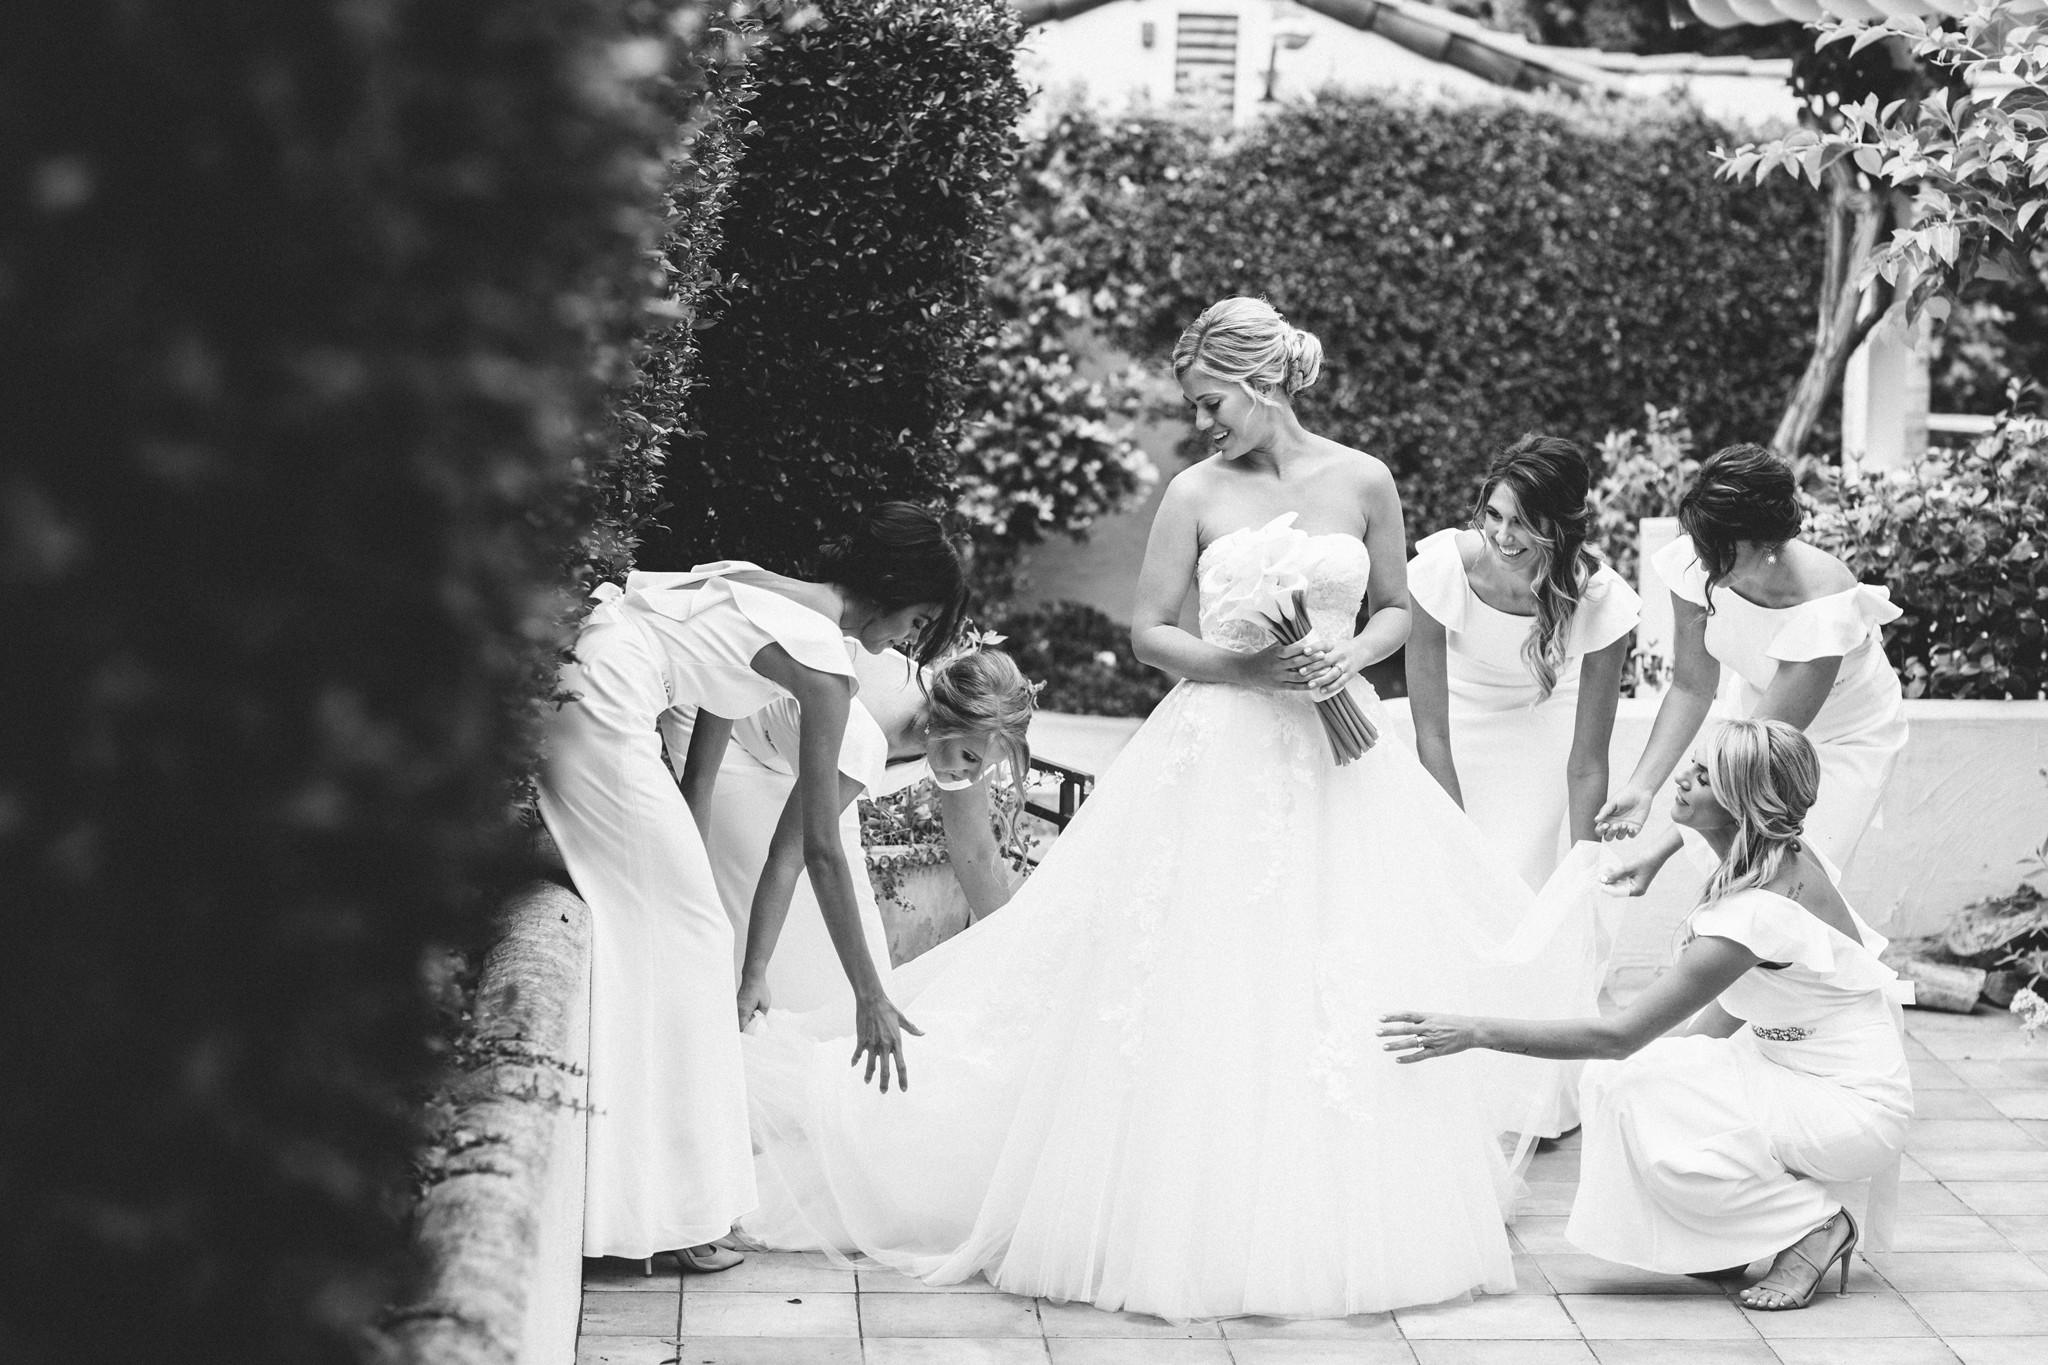 44 THEDELAURAS_THE_INN_AT_RANCHO_SANTA_FE_WEDDING_FLOWERS_BLOG044.jpg